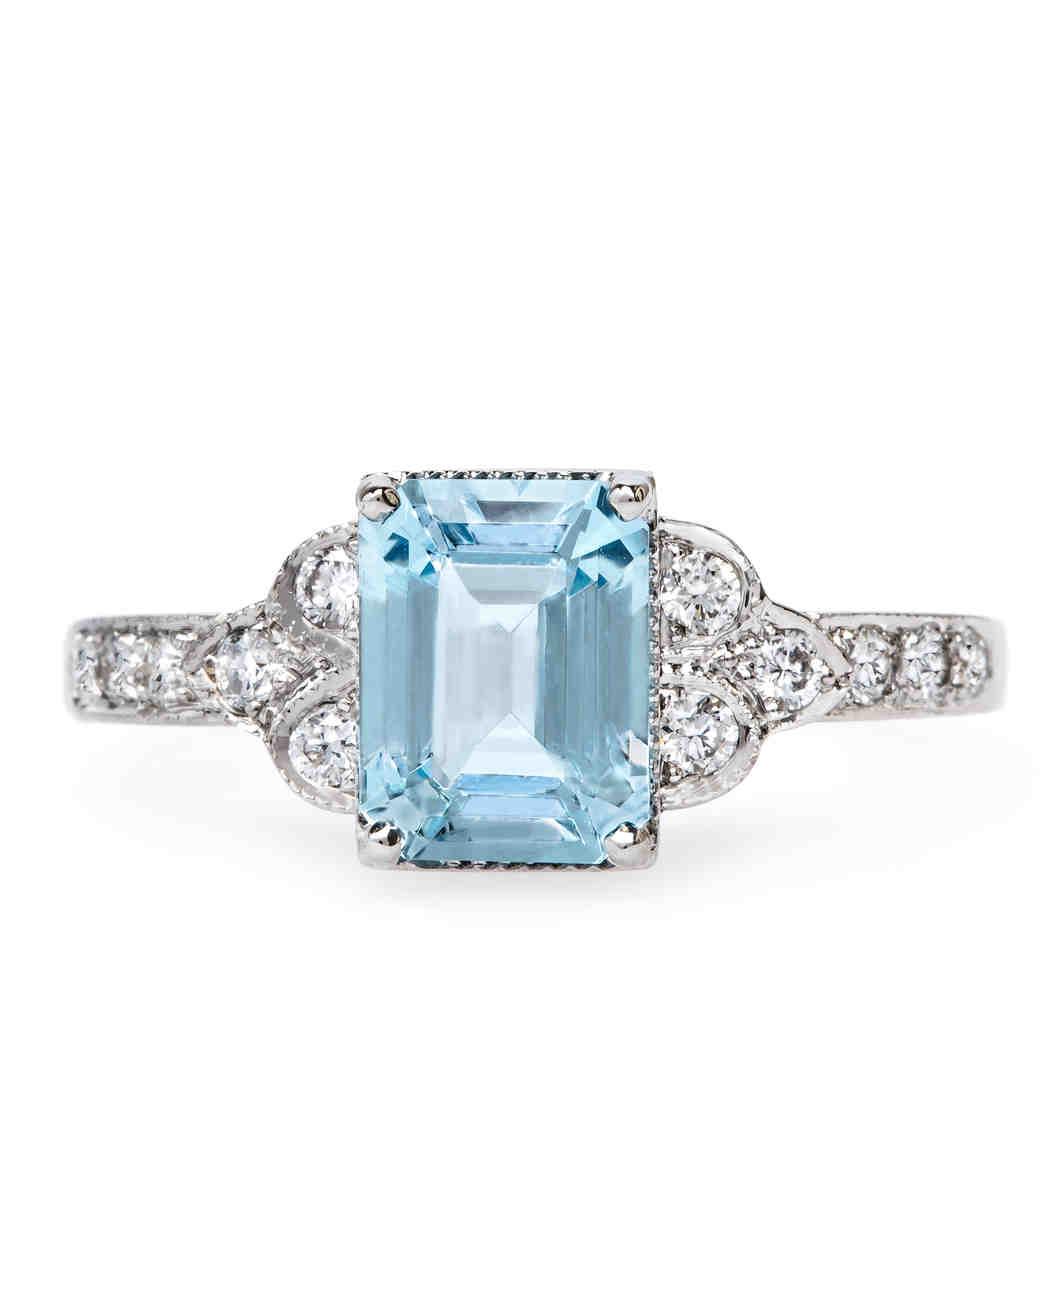 claire-pettibone-ring-collection-brigitte-0915.jpg